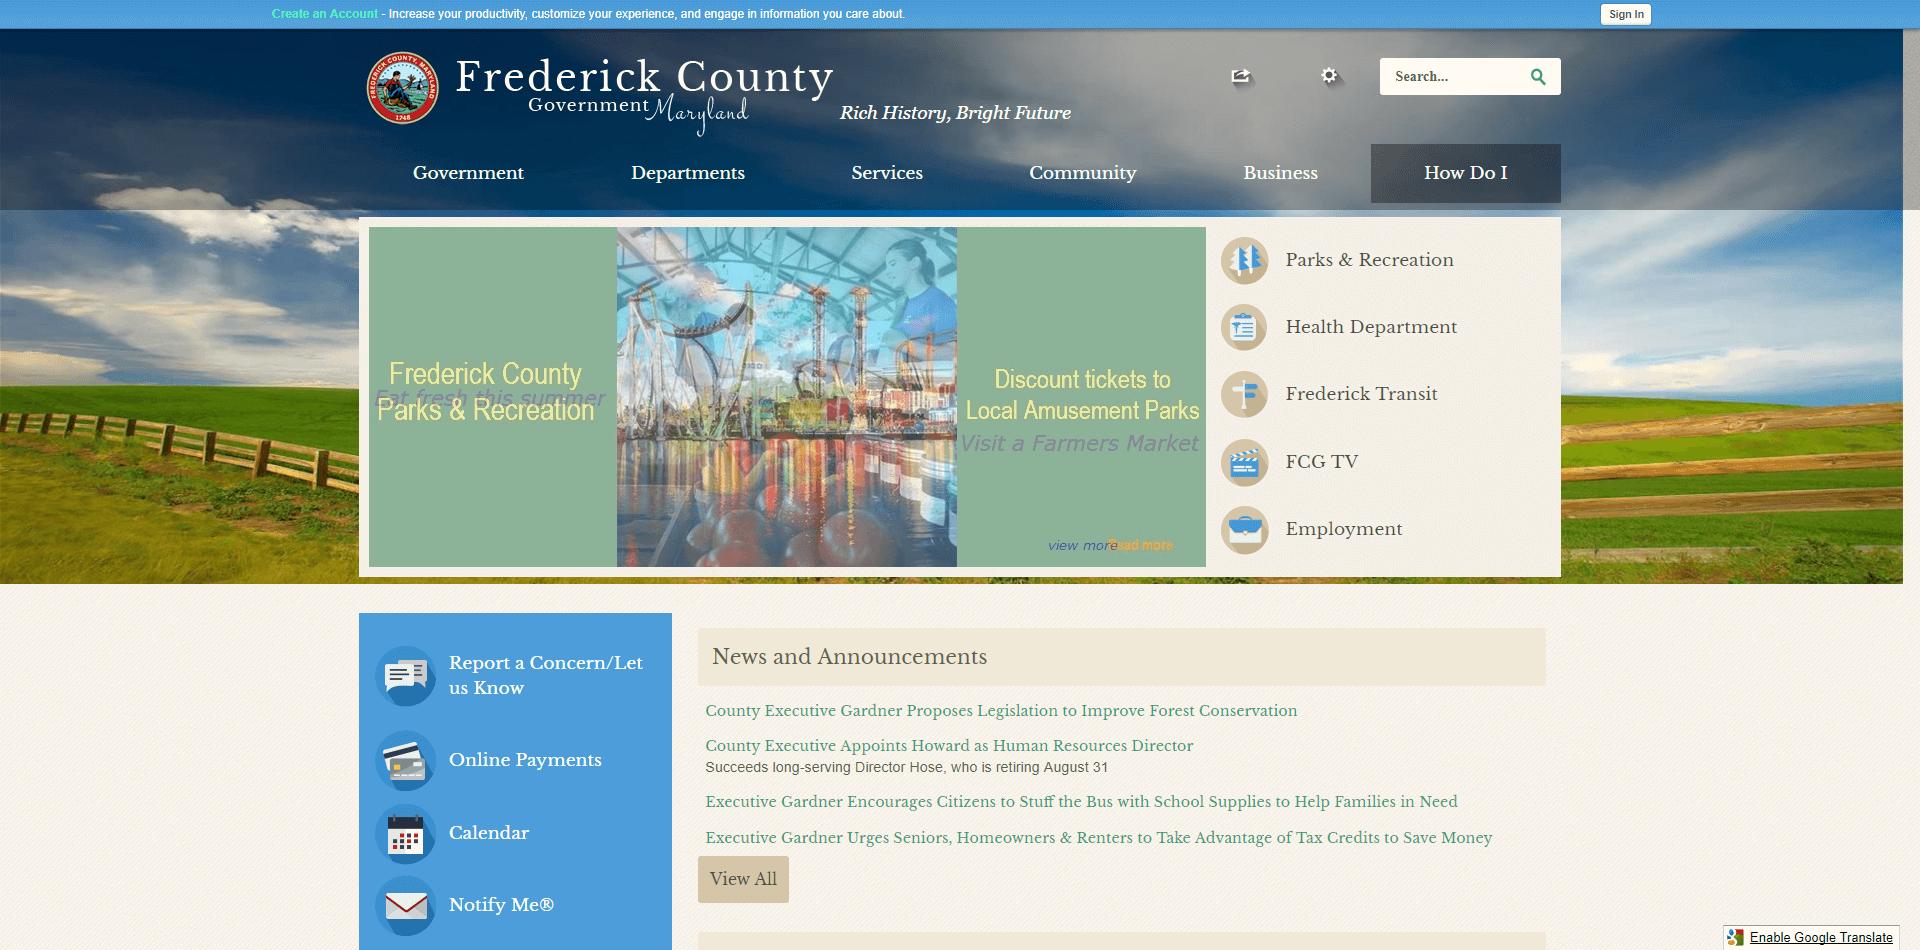 2016_Digital_Counties_Survey_Winner_Frederick_Co_MD.png